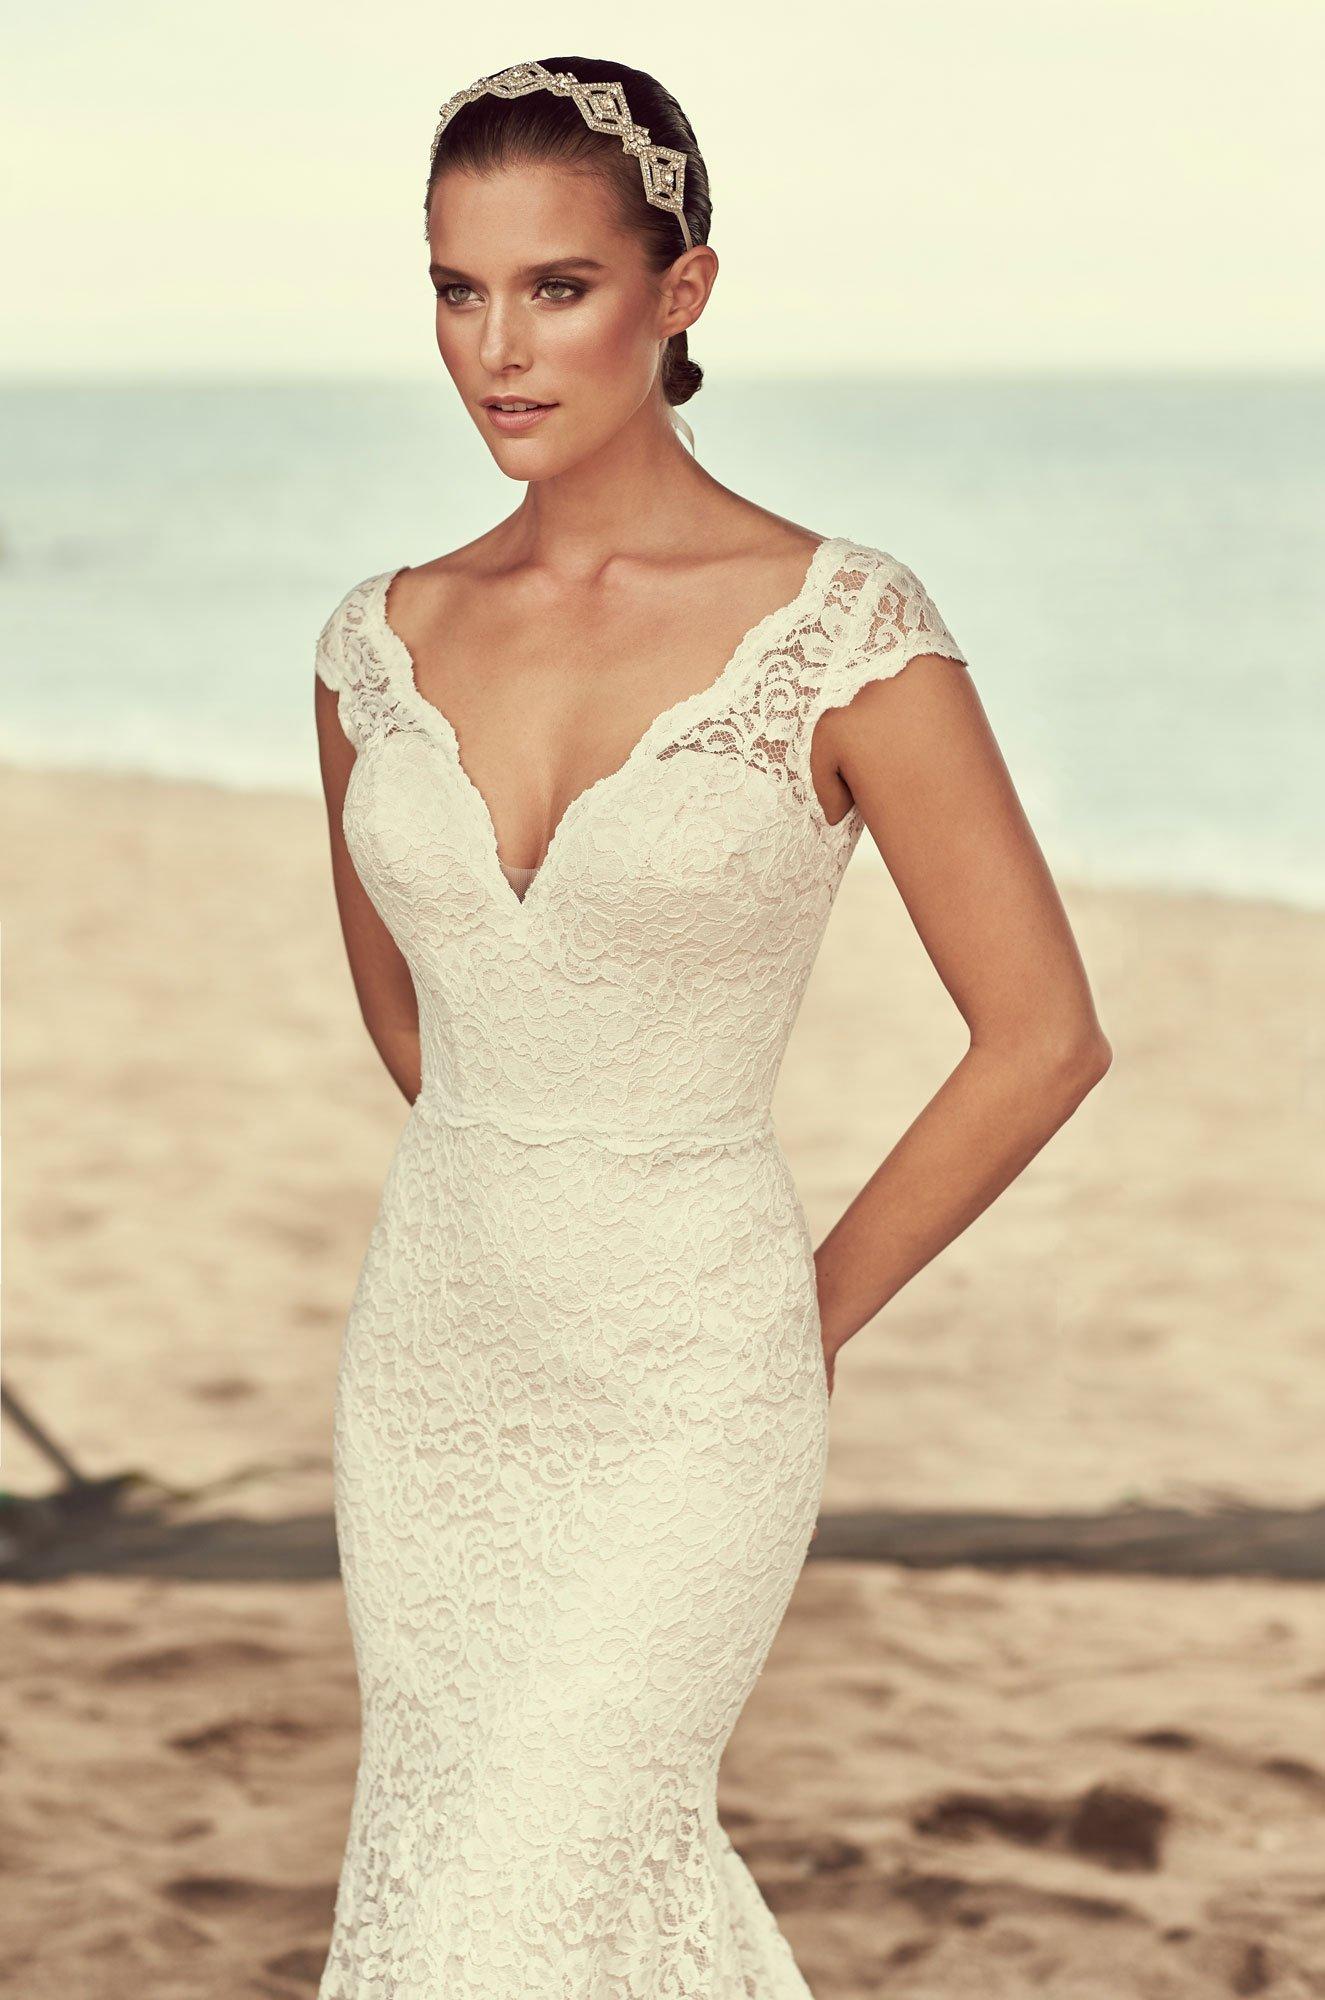 Scalloped Neckline Wedding Dress - Style #2189 | Mikaella Bridal